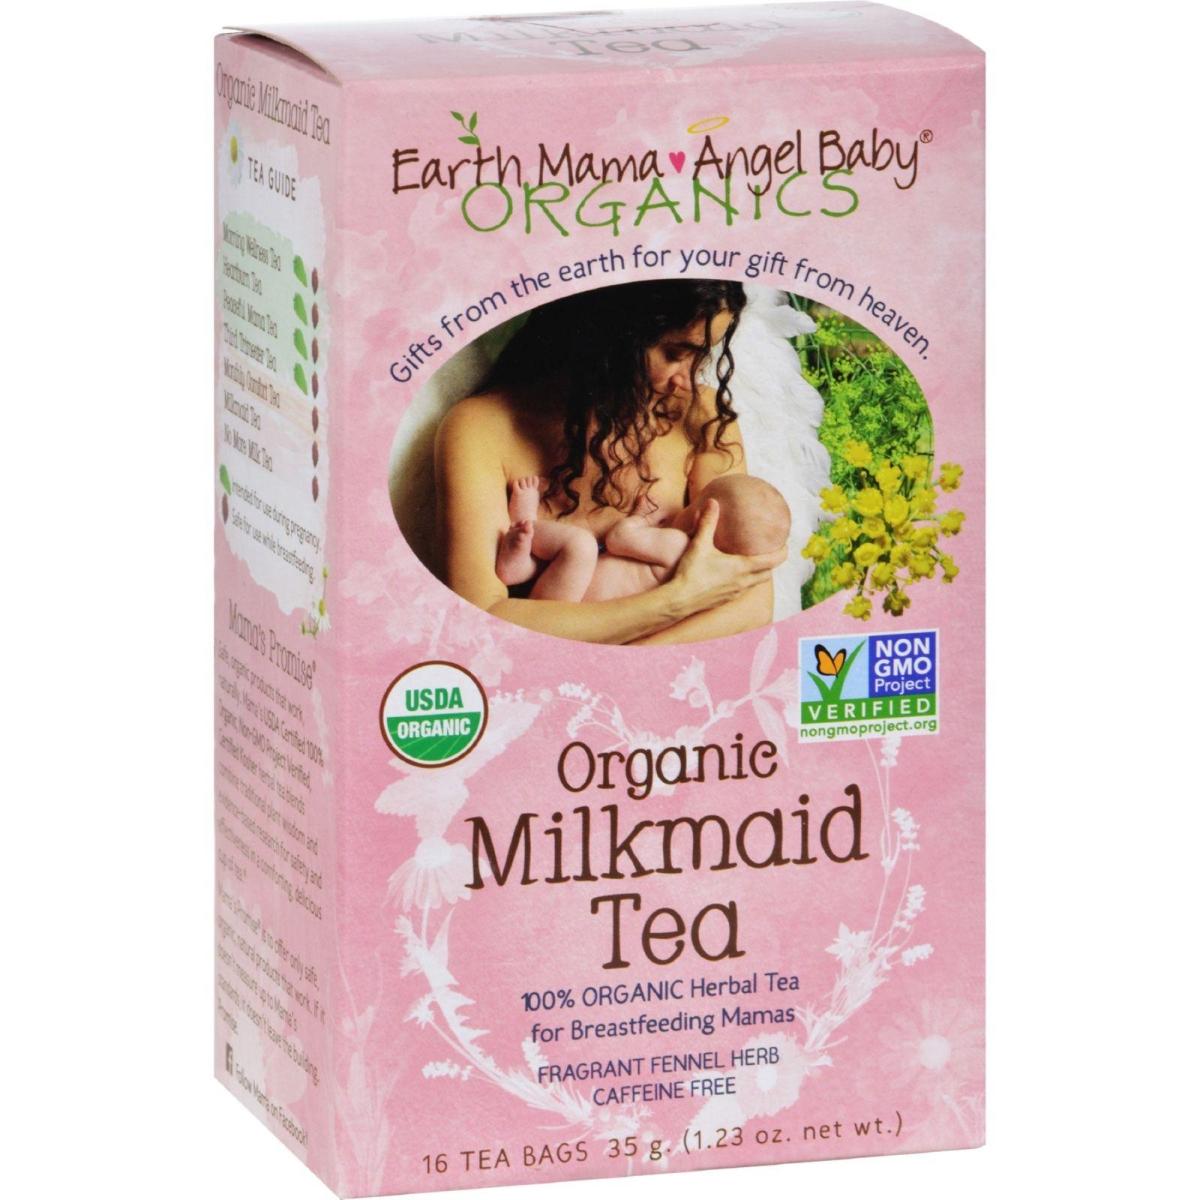 Earth Mama Angel Baby HG0466300 Organic Milkmade Tea - 16 Tea Bags